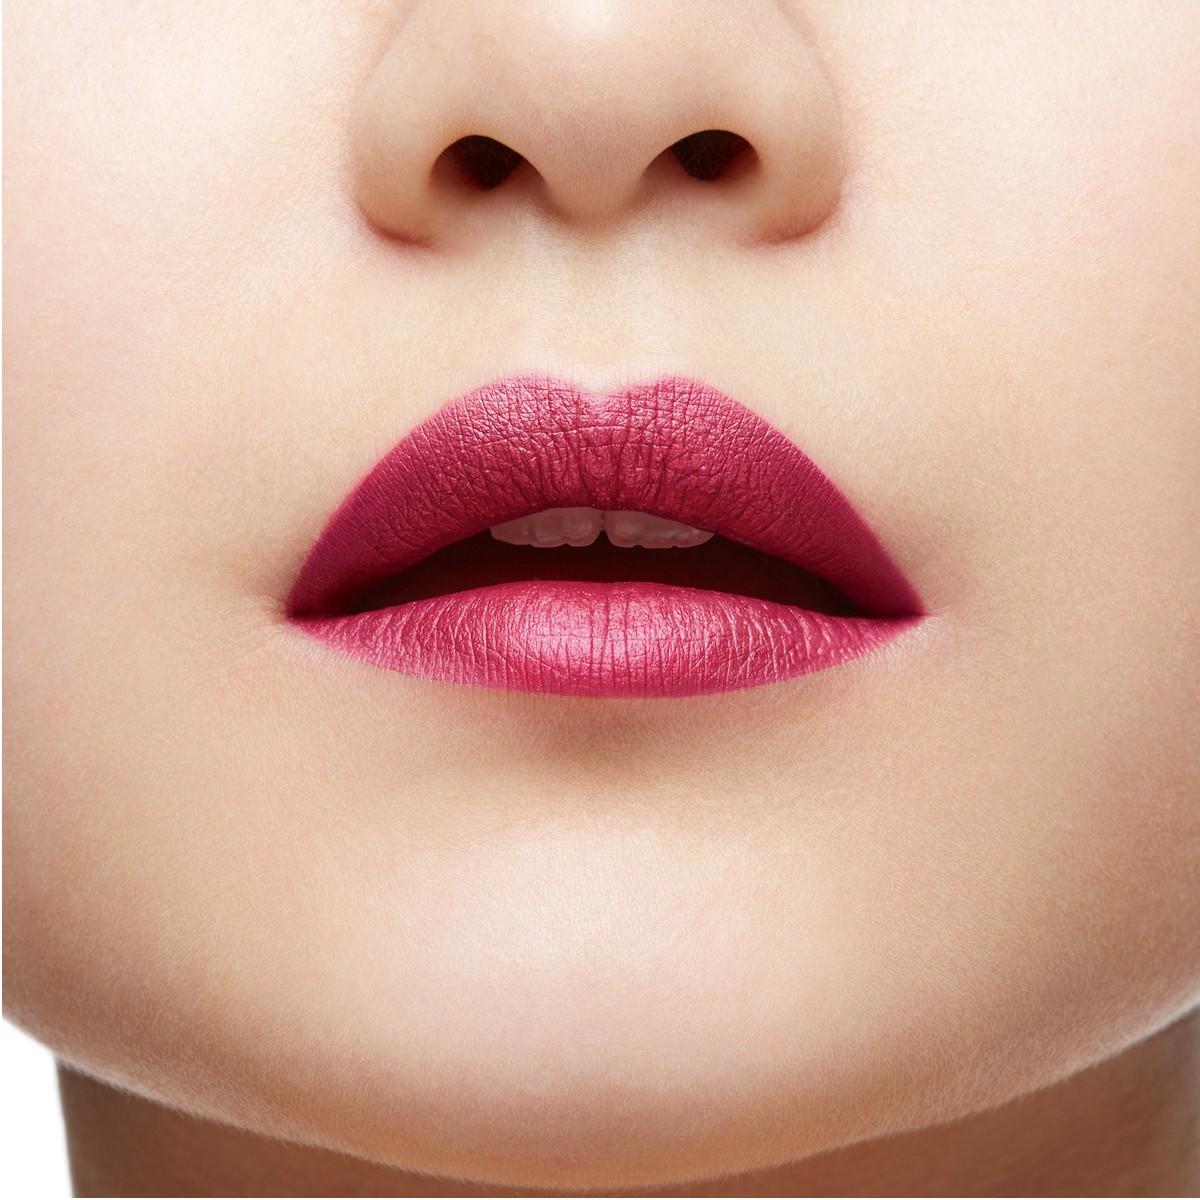 Woman Beauty - ルビダズル リップカラー ミスストラッシ 598 - Christian Louboutin